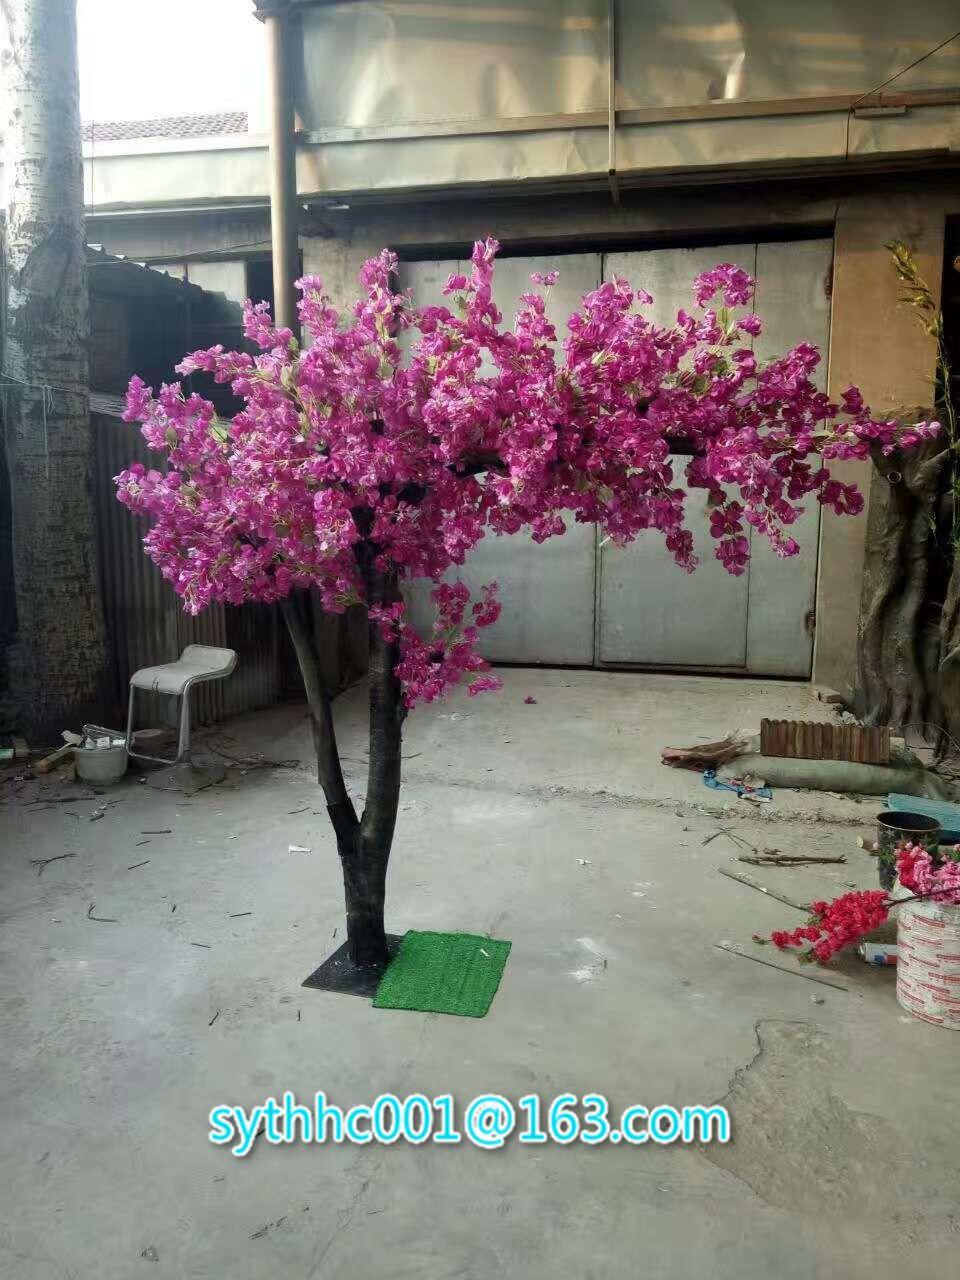 Fake Cherry Blossom Trees Shenyang Tianshun Hongcheng Trading Co Ltd Artificial Cherry Blossom Tree Blossom Tree Wedding Cherry Blossom Tree